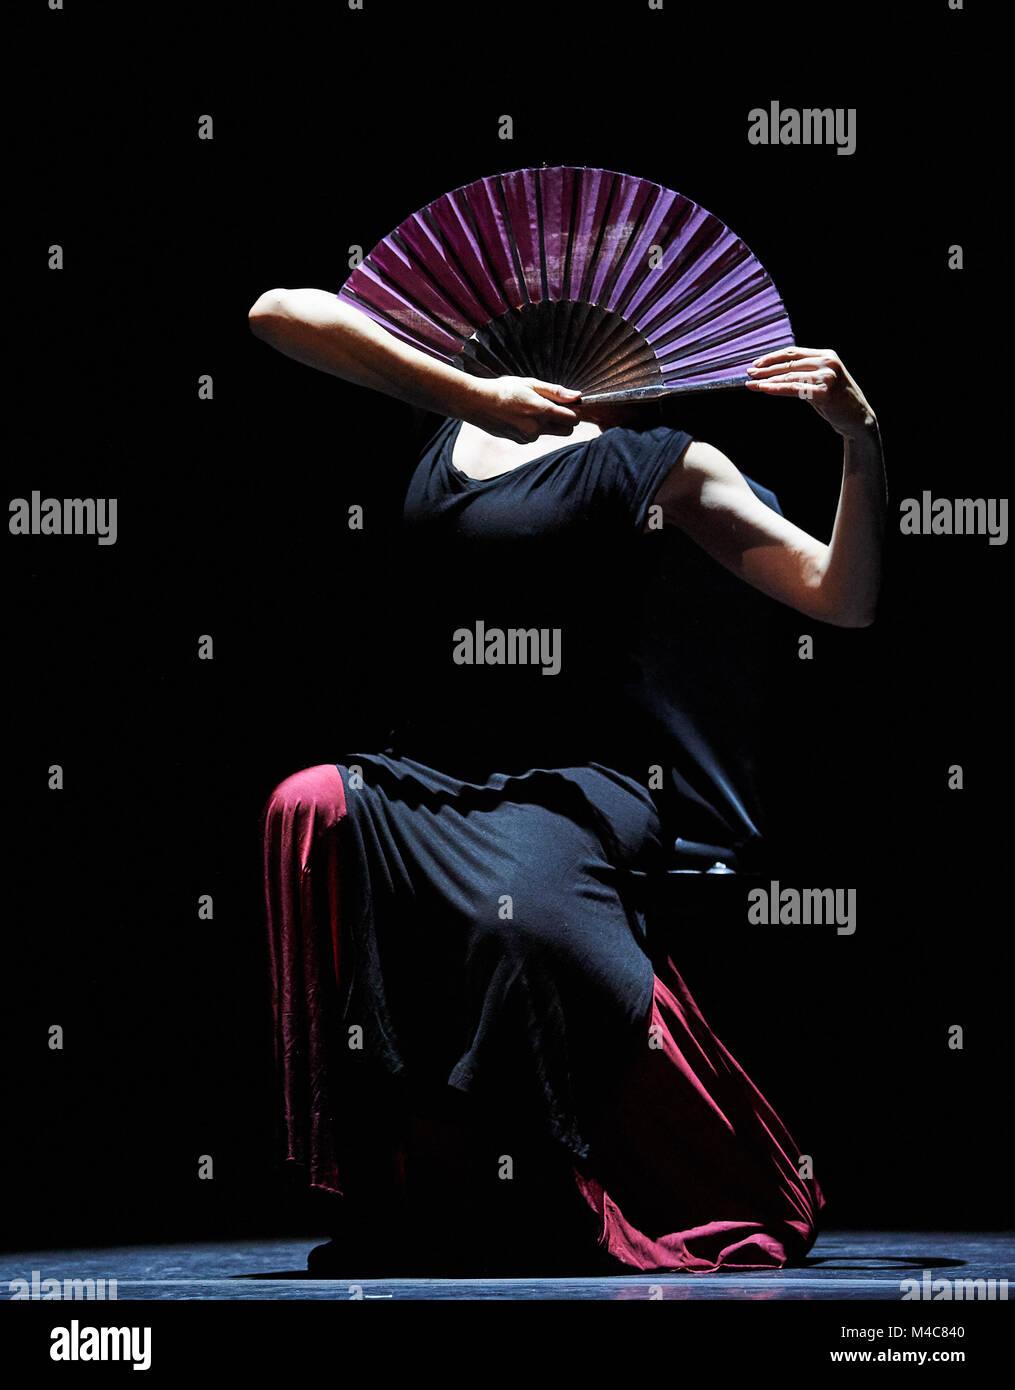 London, UK. 15th Feb, 2018. Maria Pages performs  Yo Carmen as part of the London Flamenco festival at Sadler's - Stock Image